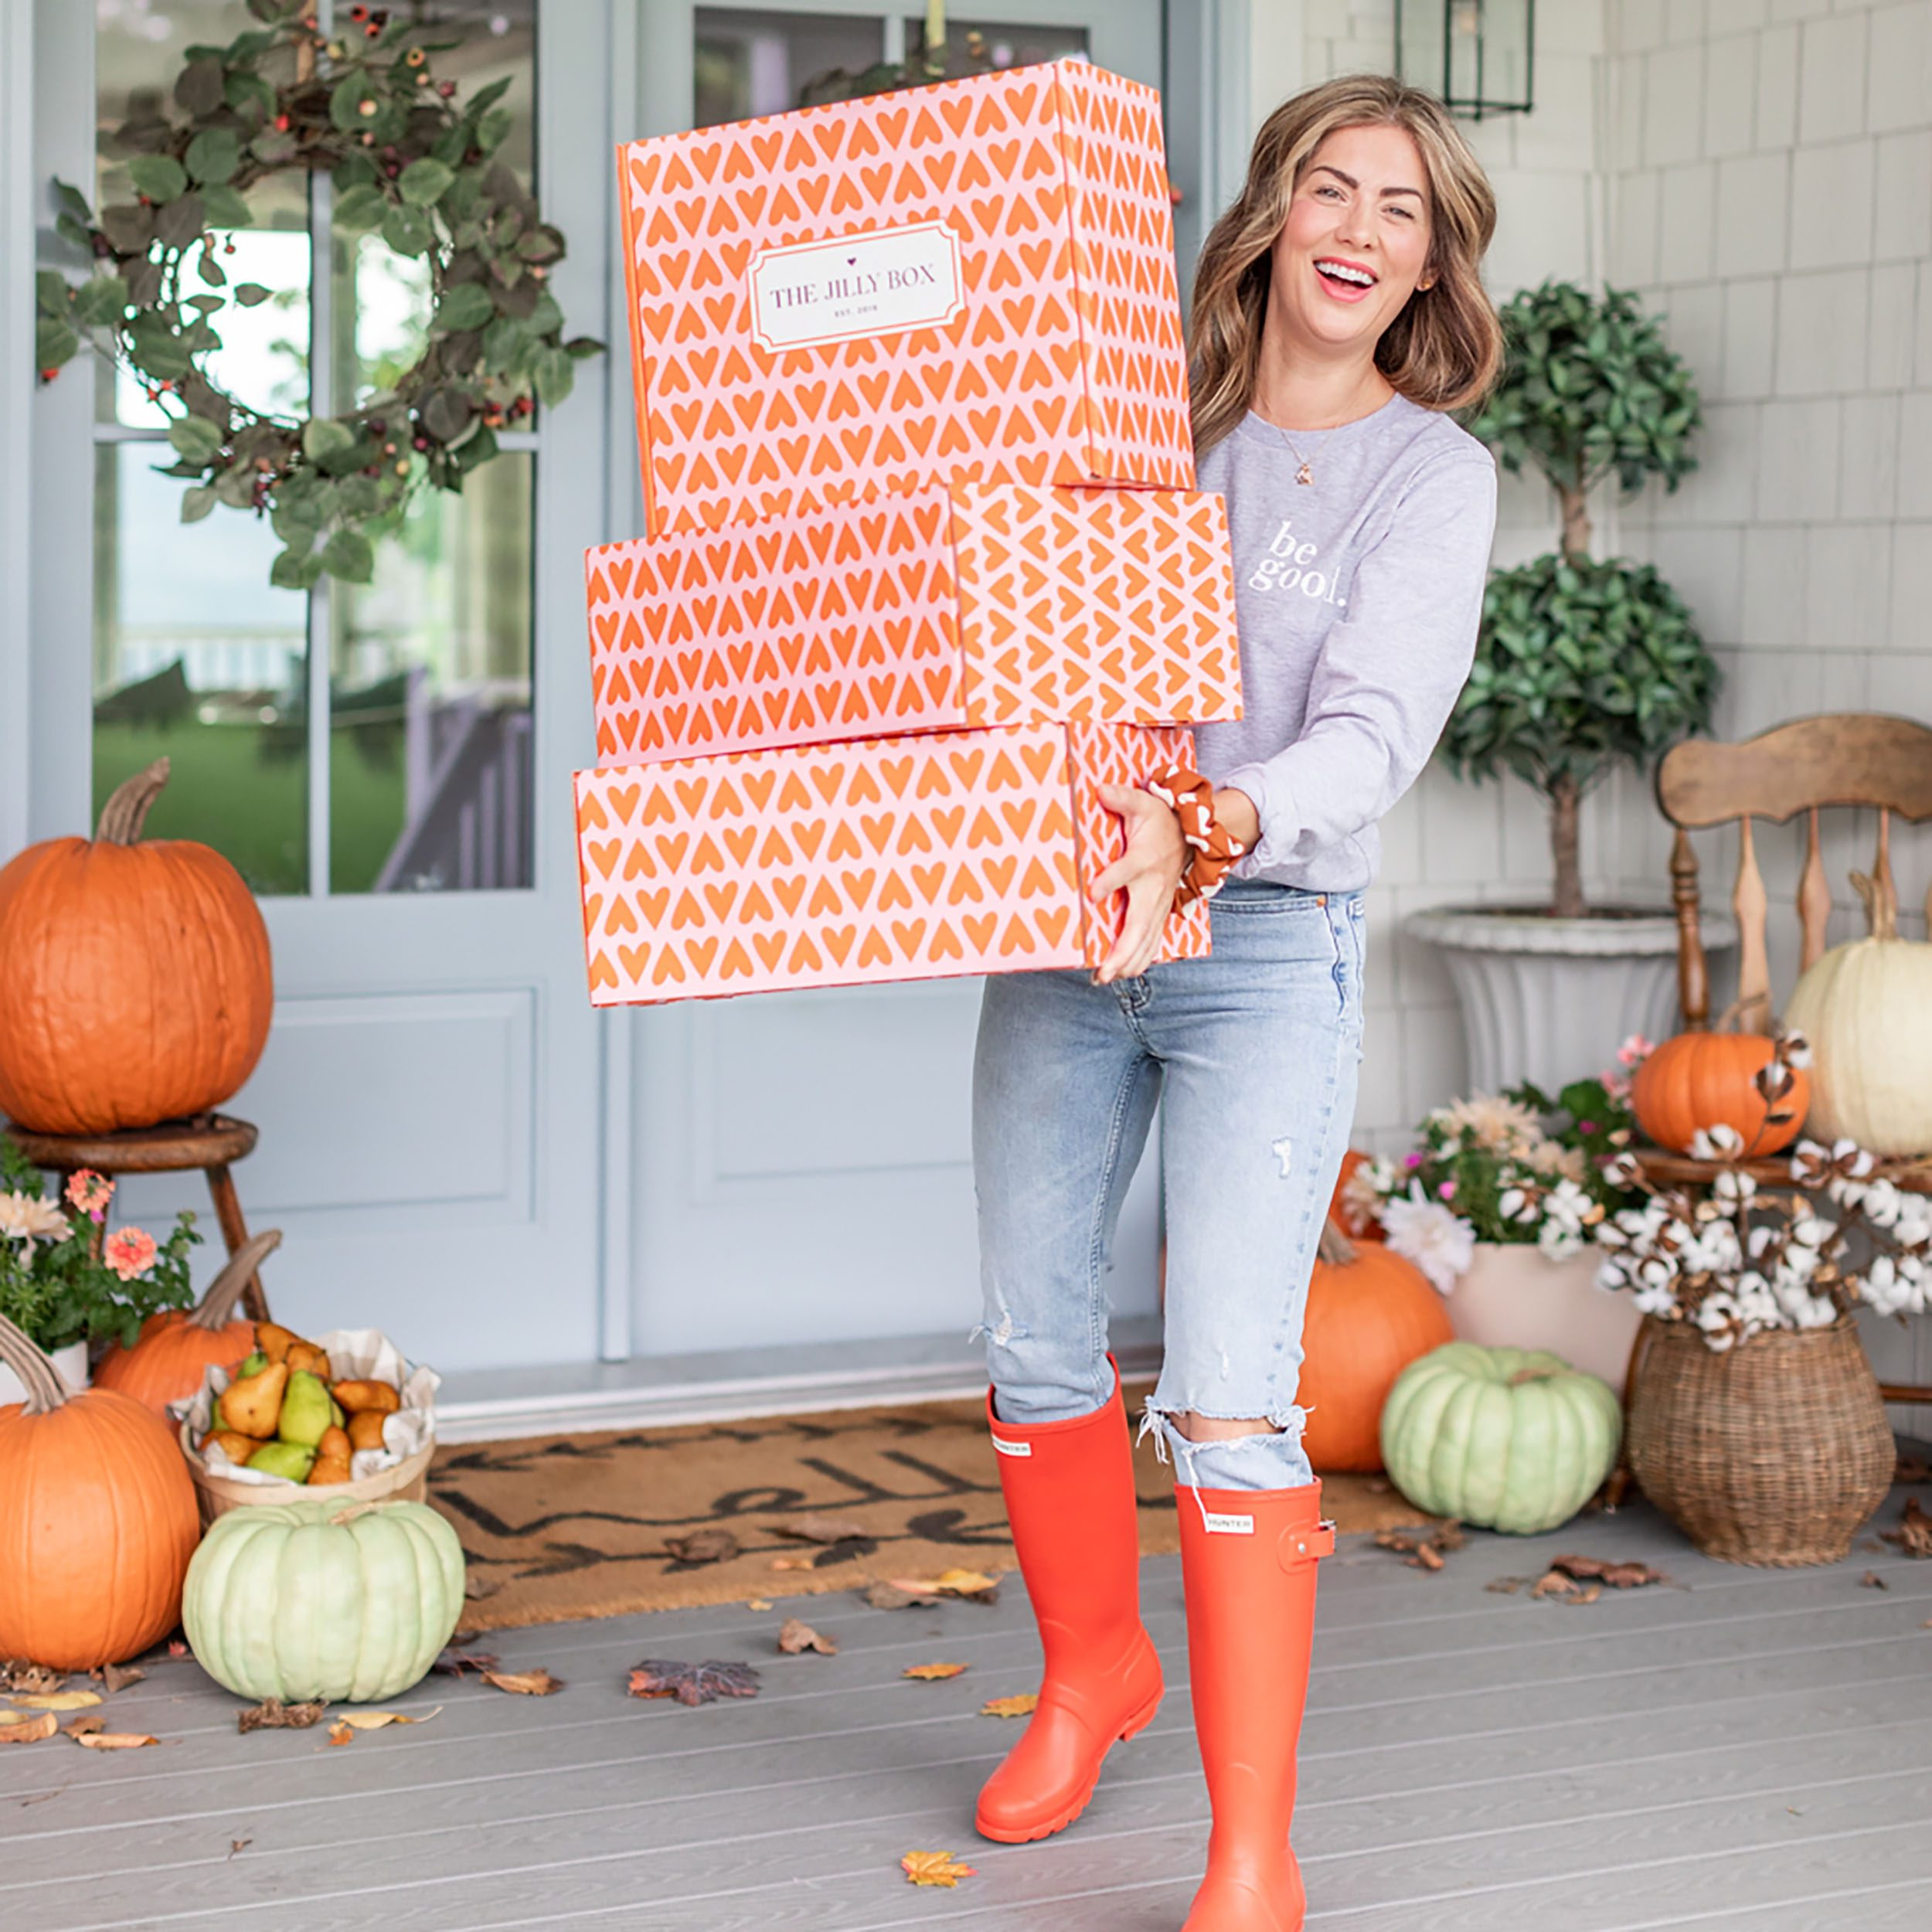 Jilly Box Fall 2020